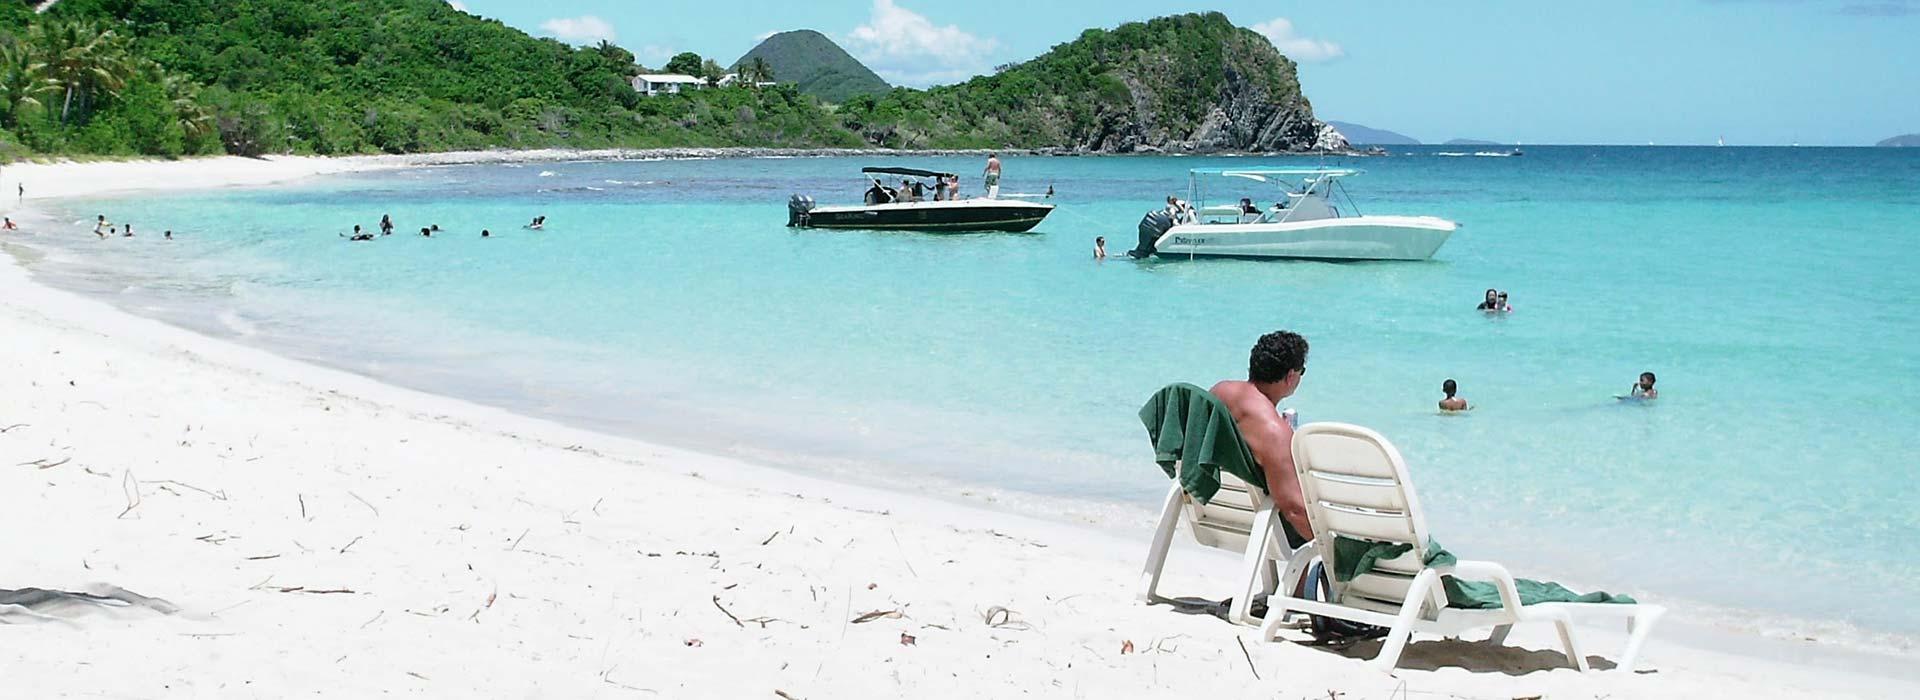 British Virgin Islands Vacation